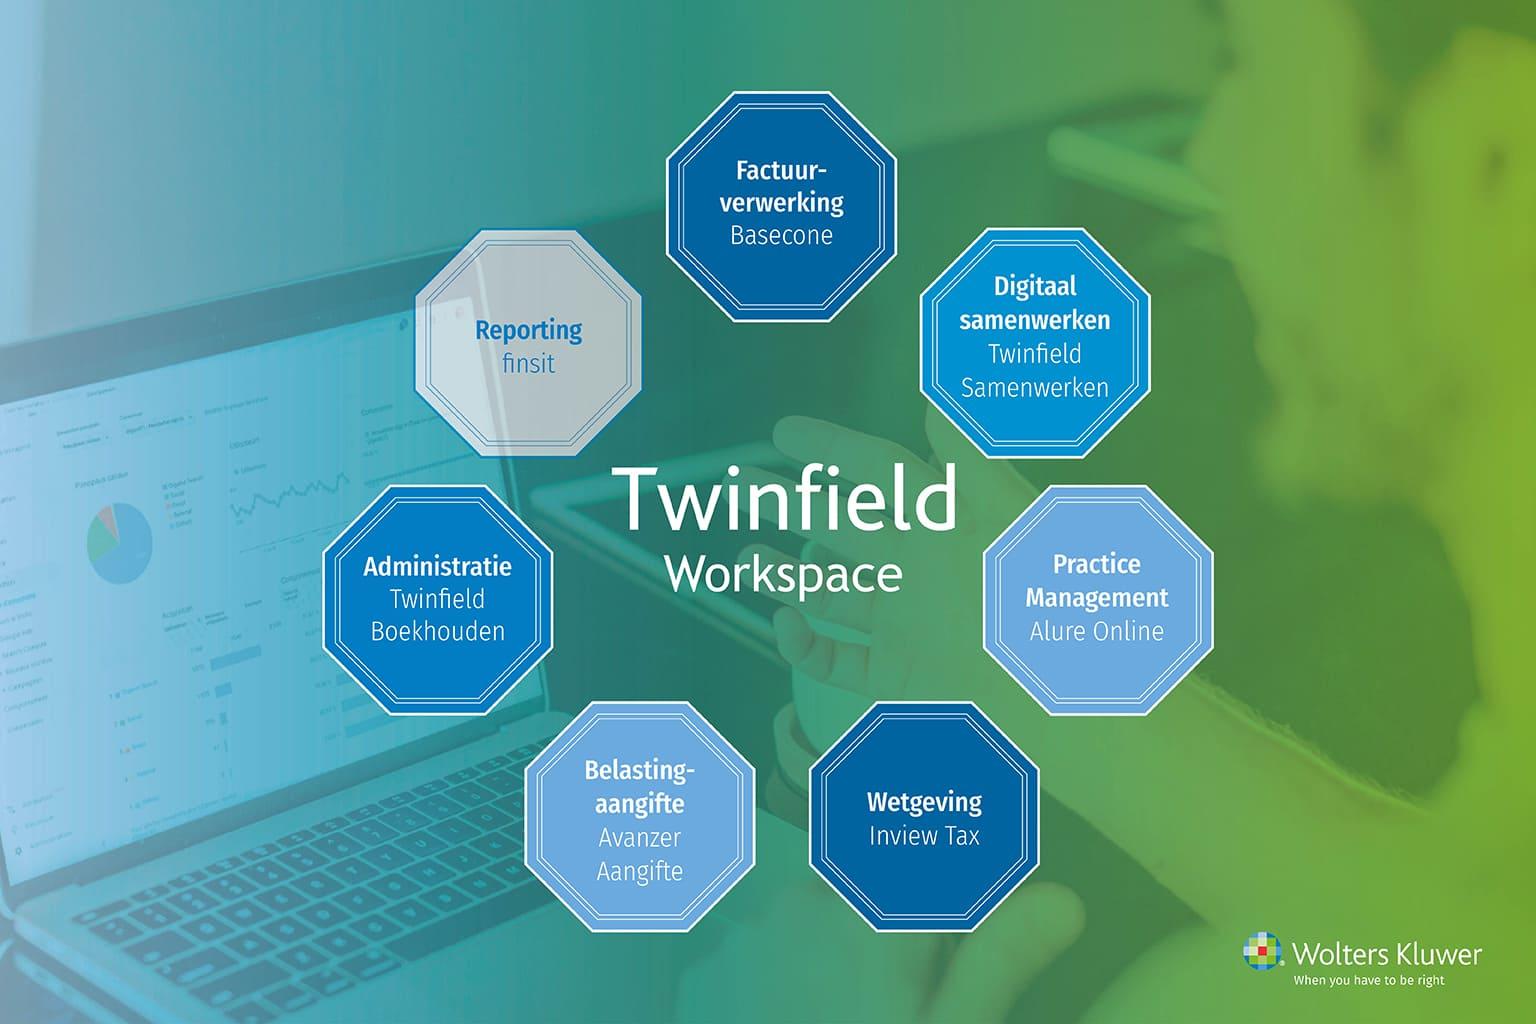 Twinfield Workspace